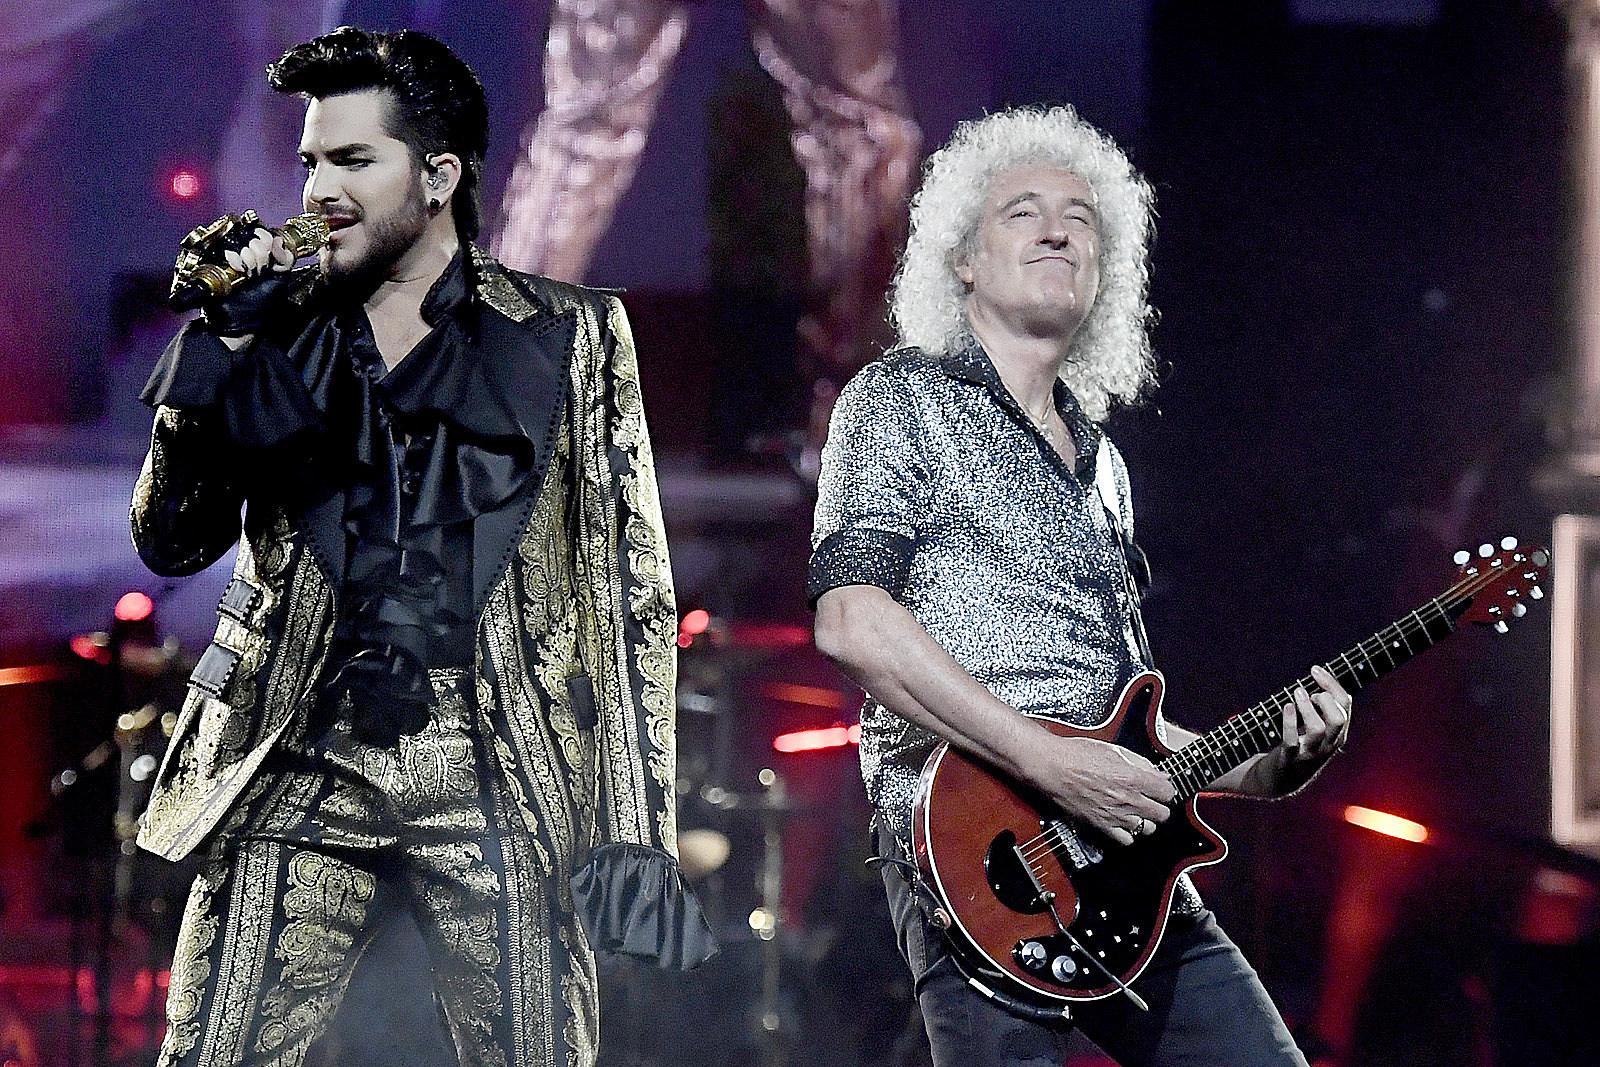 Queen's 'Bohemian Rhapsody' Video Hits One Billion YouTube Views